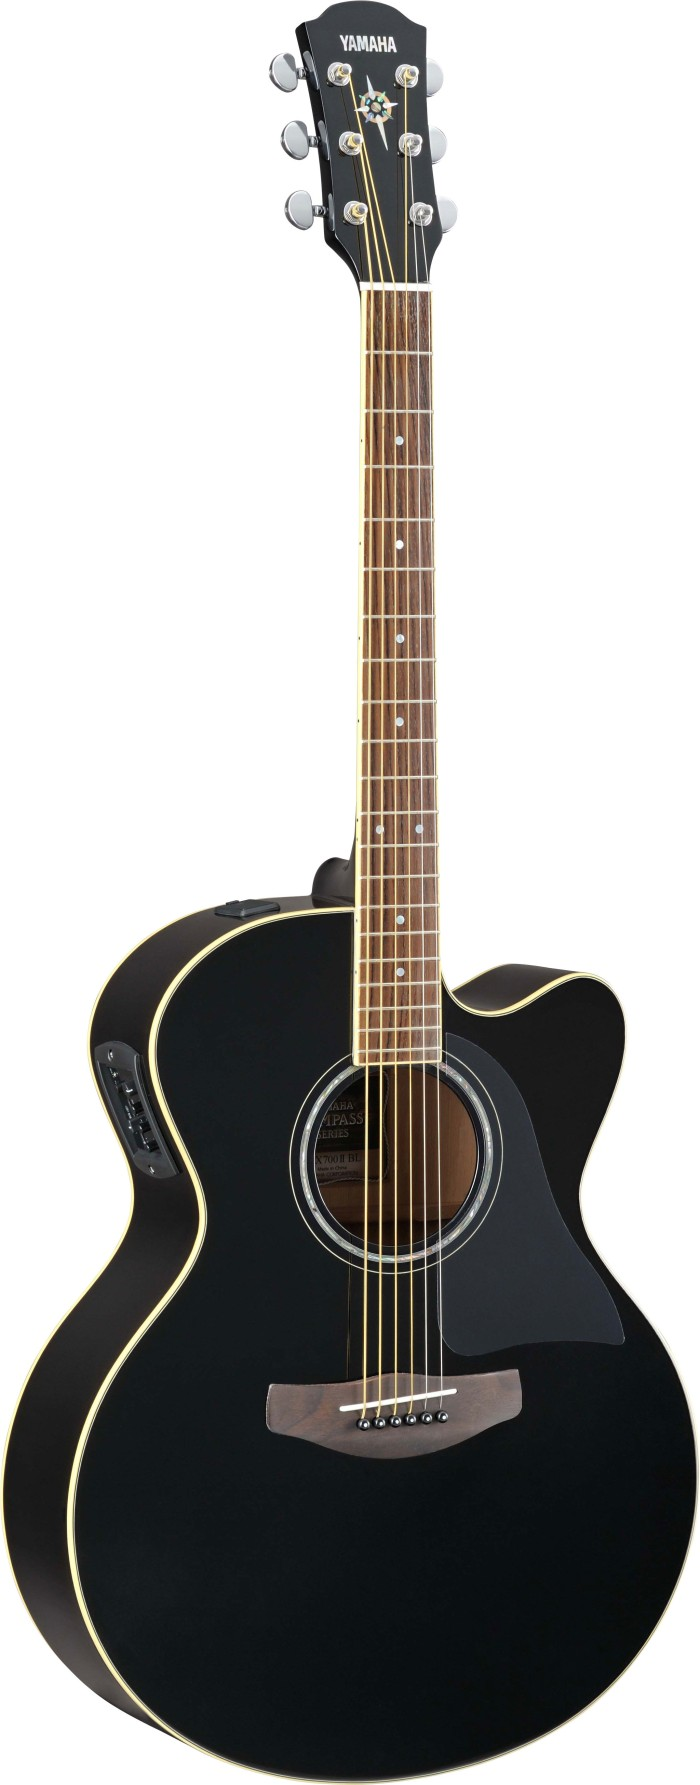 harga Gitar akustik yamaha cpx500ii Tokopedia.com